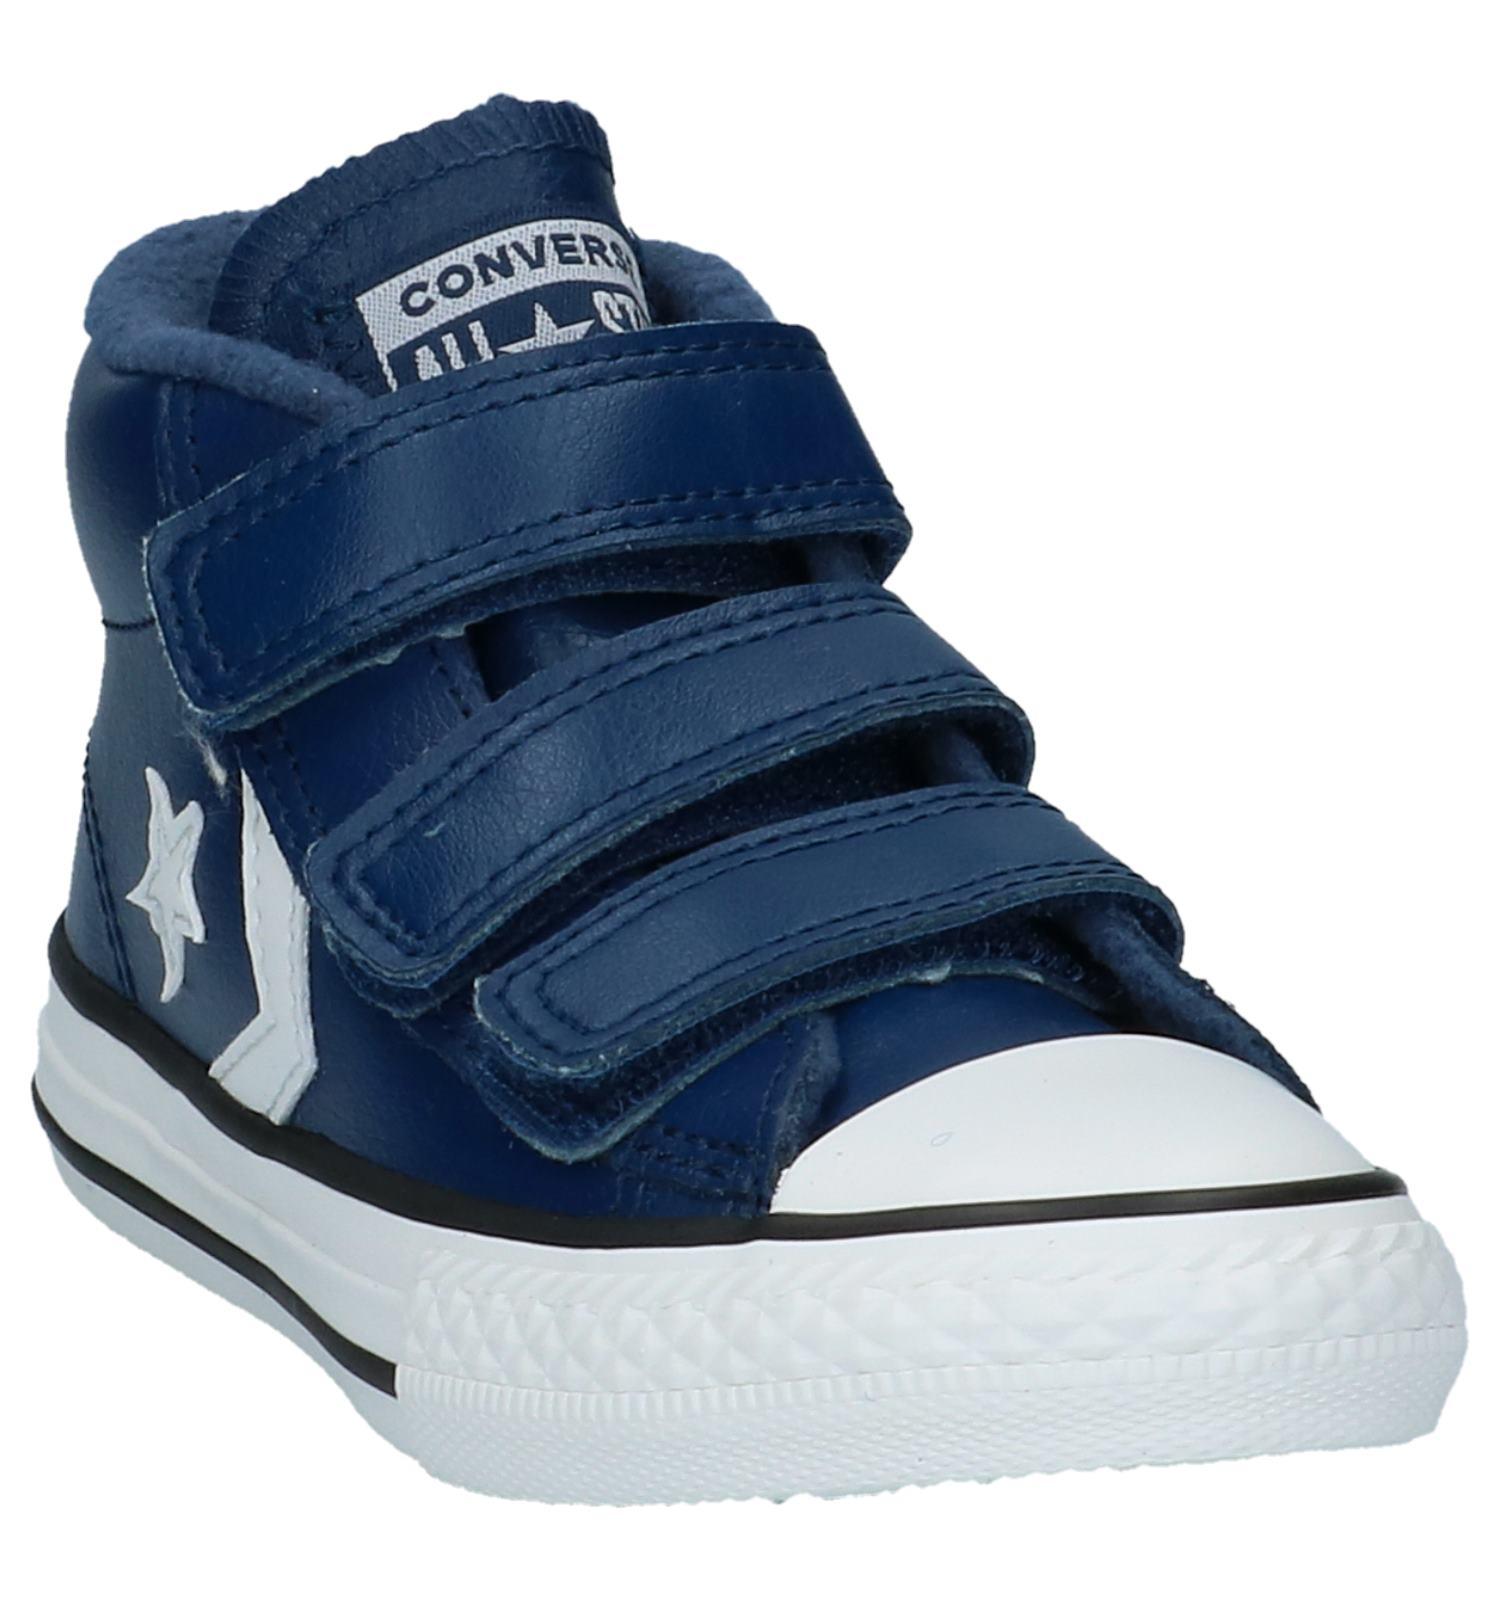 b4579cd0e35 Blauwe Sneakers Converse Star Player 3V Mid | TORFS.BE | Gratis verzend en  retour